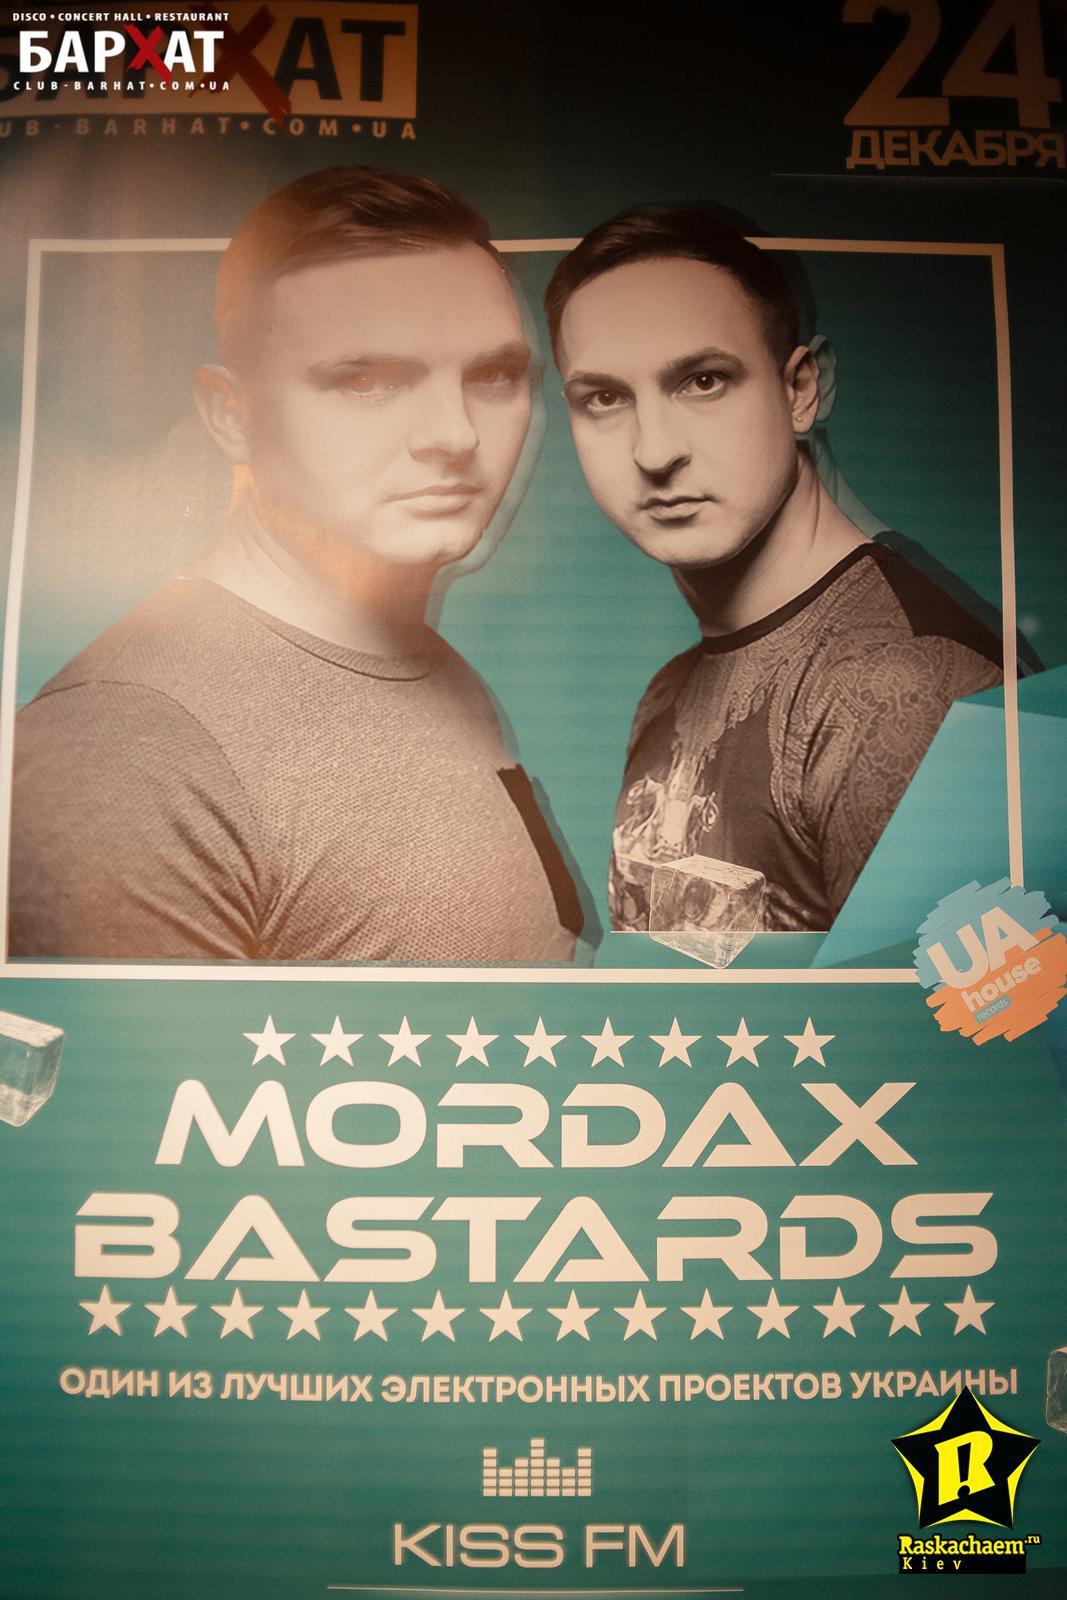 MORDAX Bastards @ Бархат, Борисполь